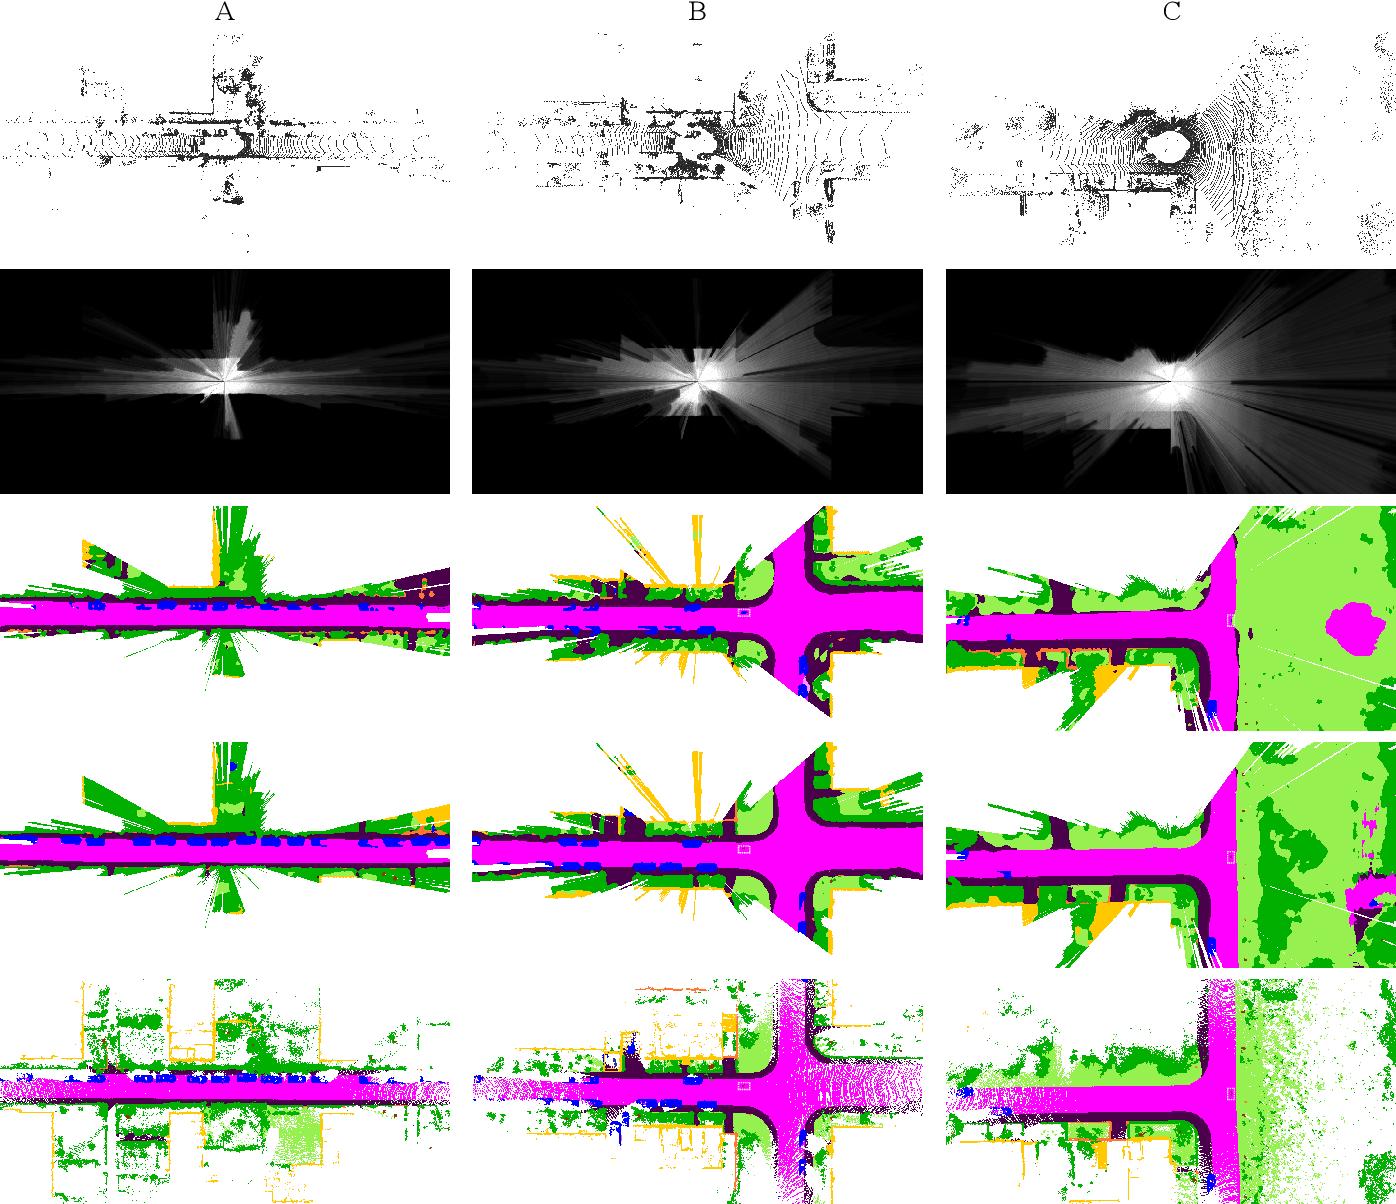 Figure 3 for PillarSegNet: Pillar-based Semantic Grid Map Estimation using Sparse LiDAR Data